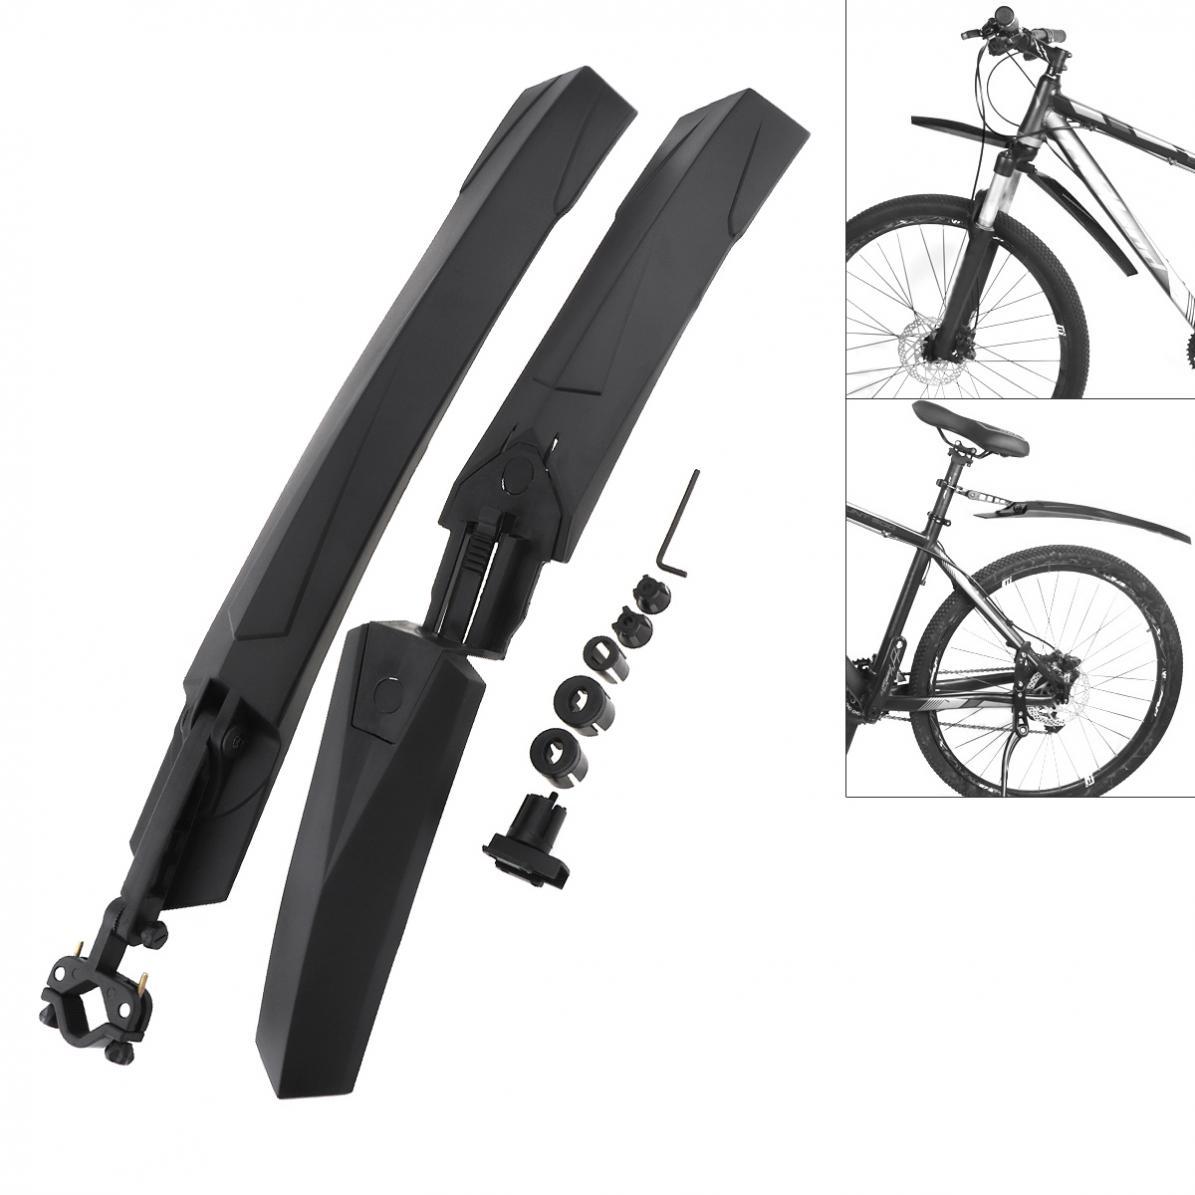 Negro ESjasnyfall Guardabarros de Bicicleta Ultraligero F/ácil de Instalar MTB Guardabarros Guardabarros Alas para Guardabarros Traseros Delanteros de Bicicleta Piezas de Bicicleta